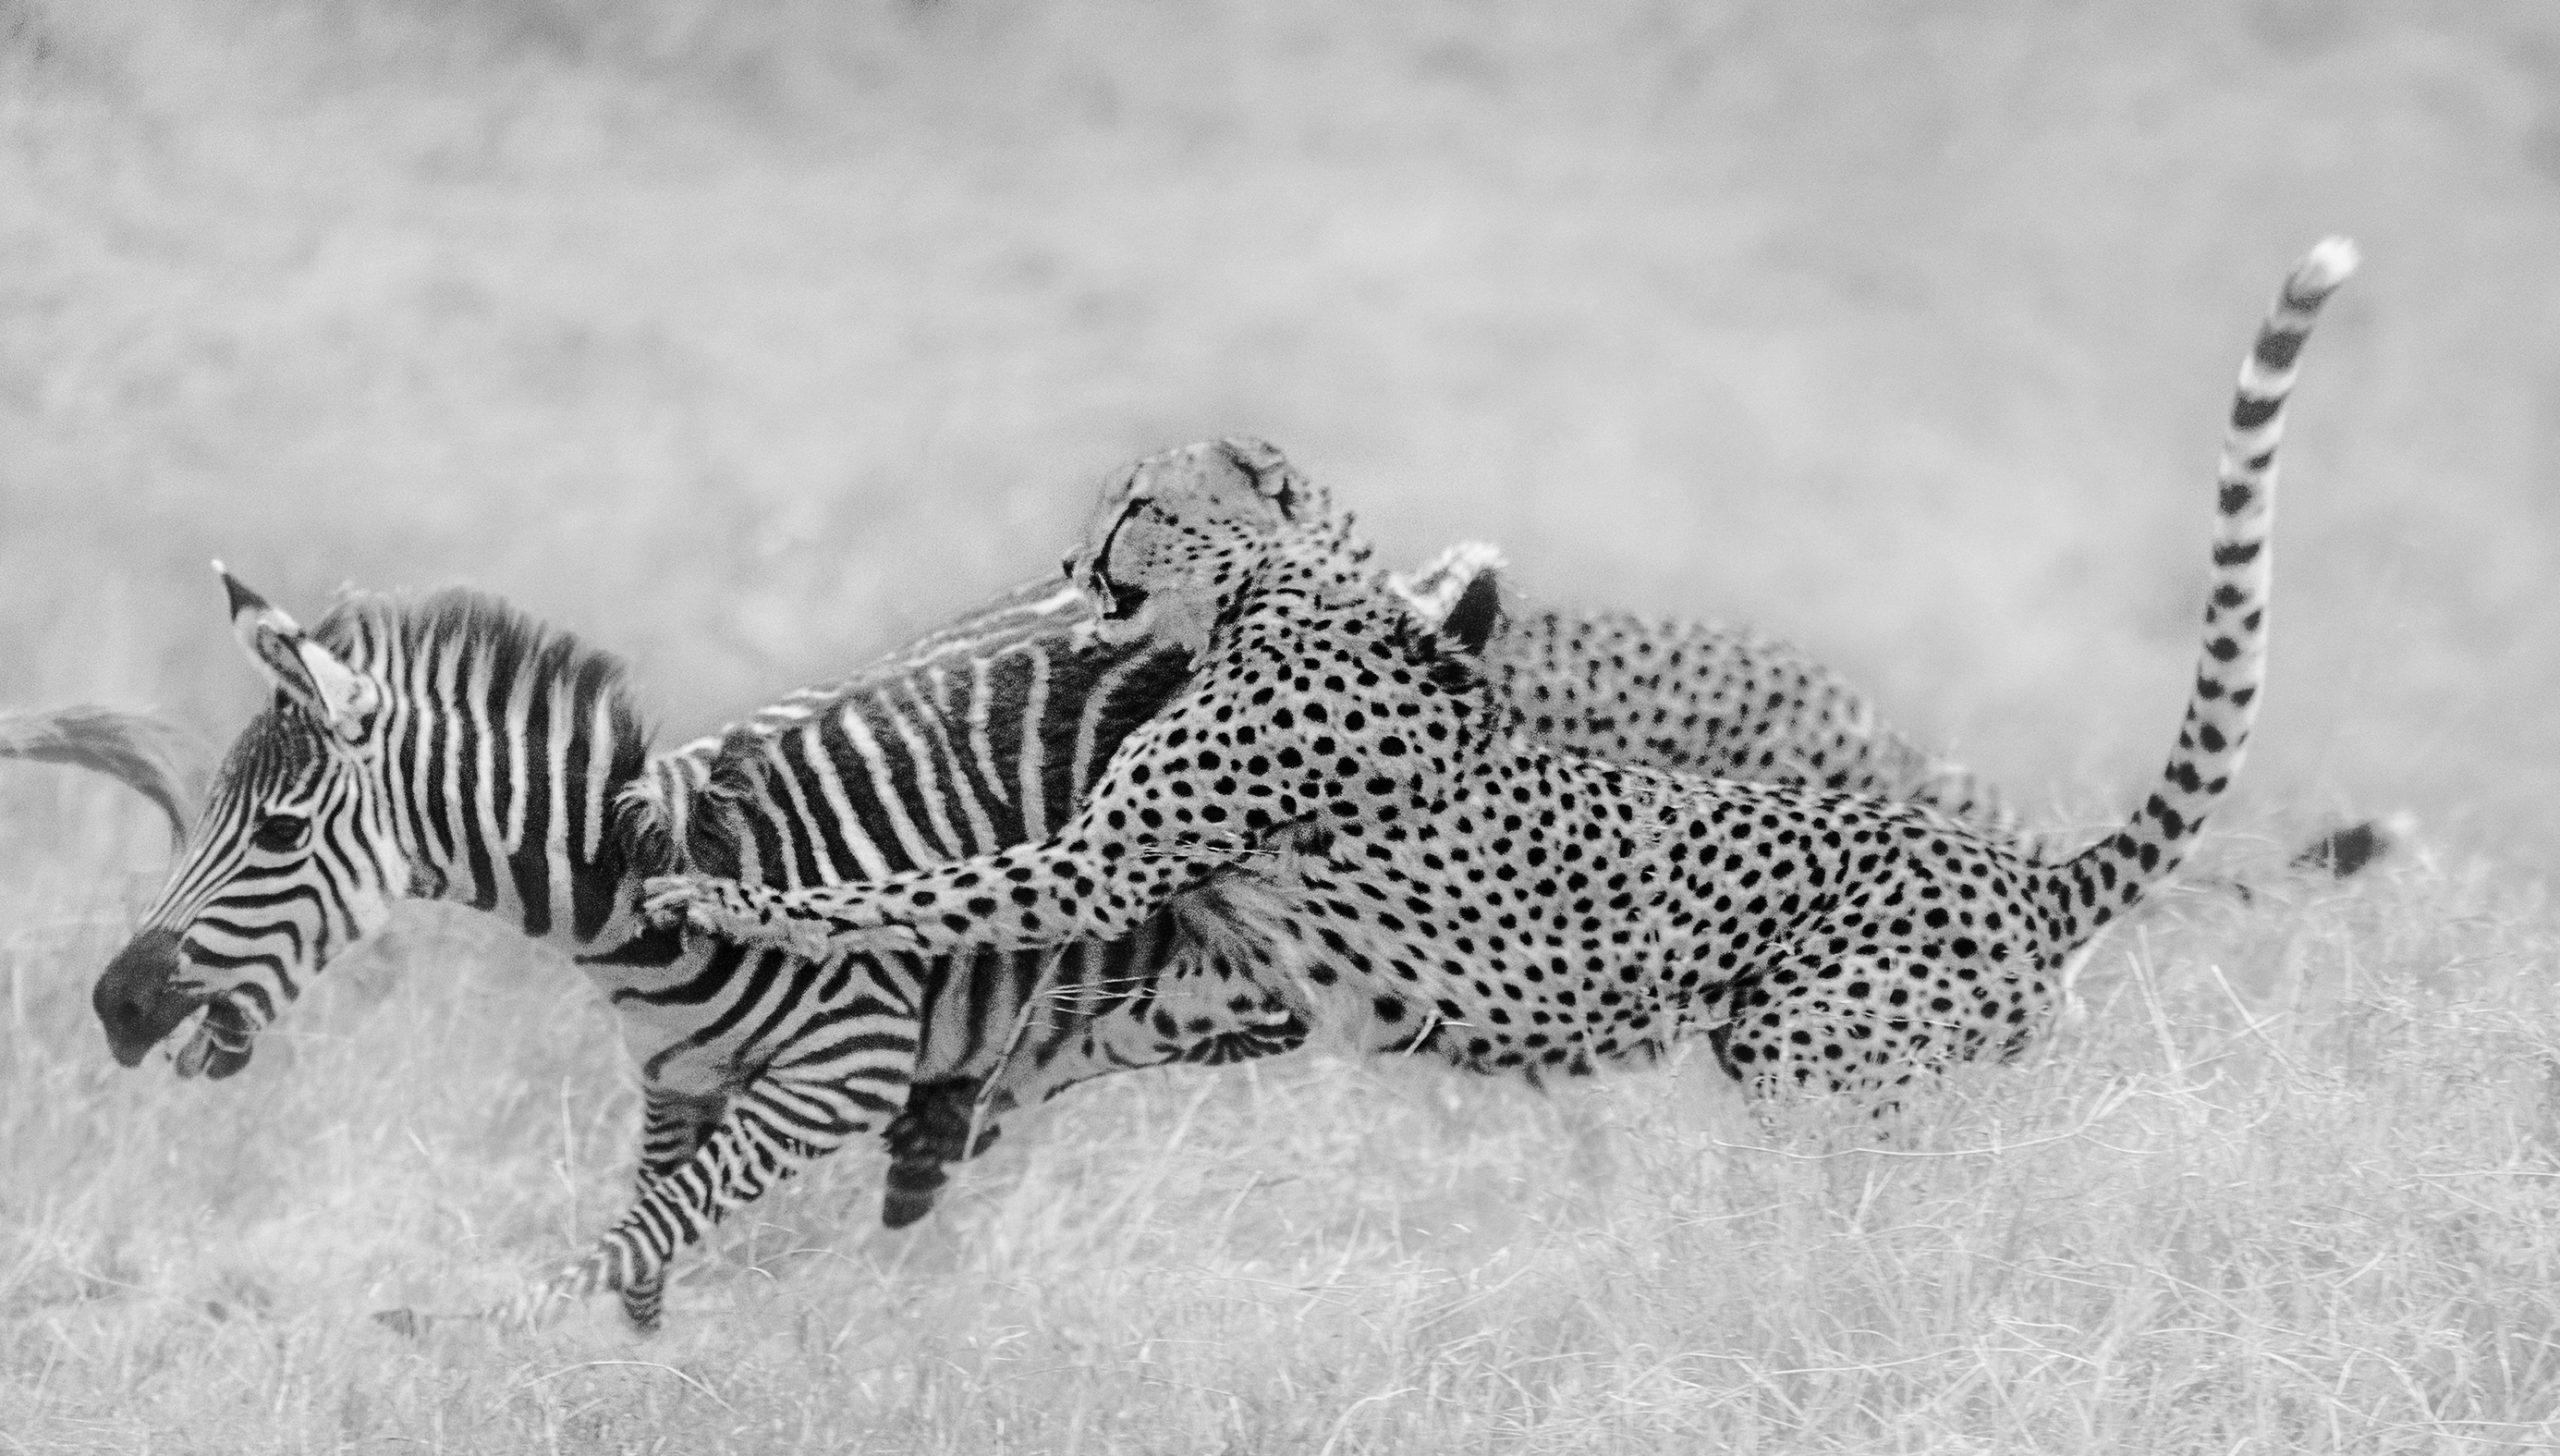 Tano Bora / Fast Five hunt a zebra during a ClementWild Photo Safari in Maasai Mara